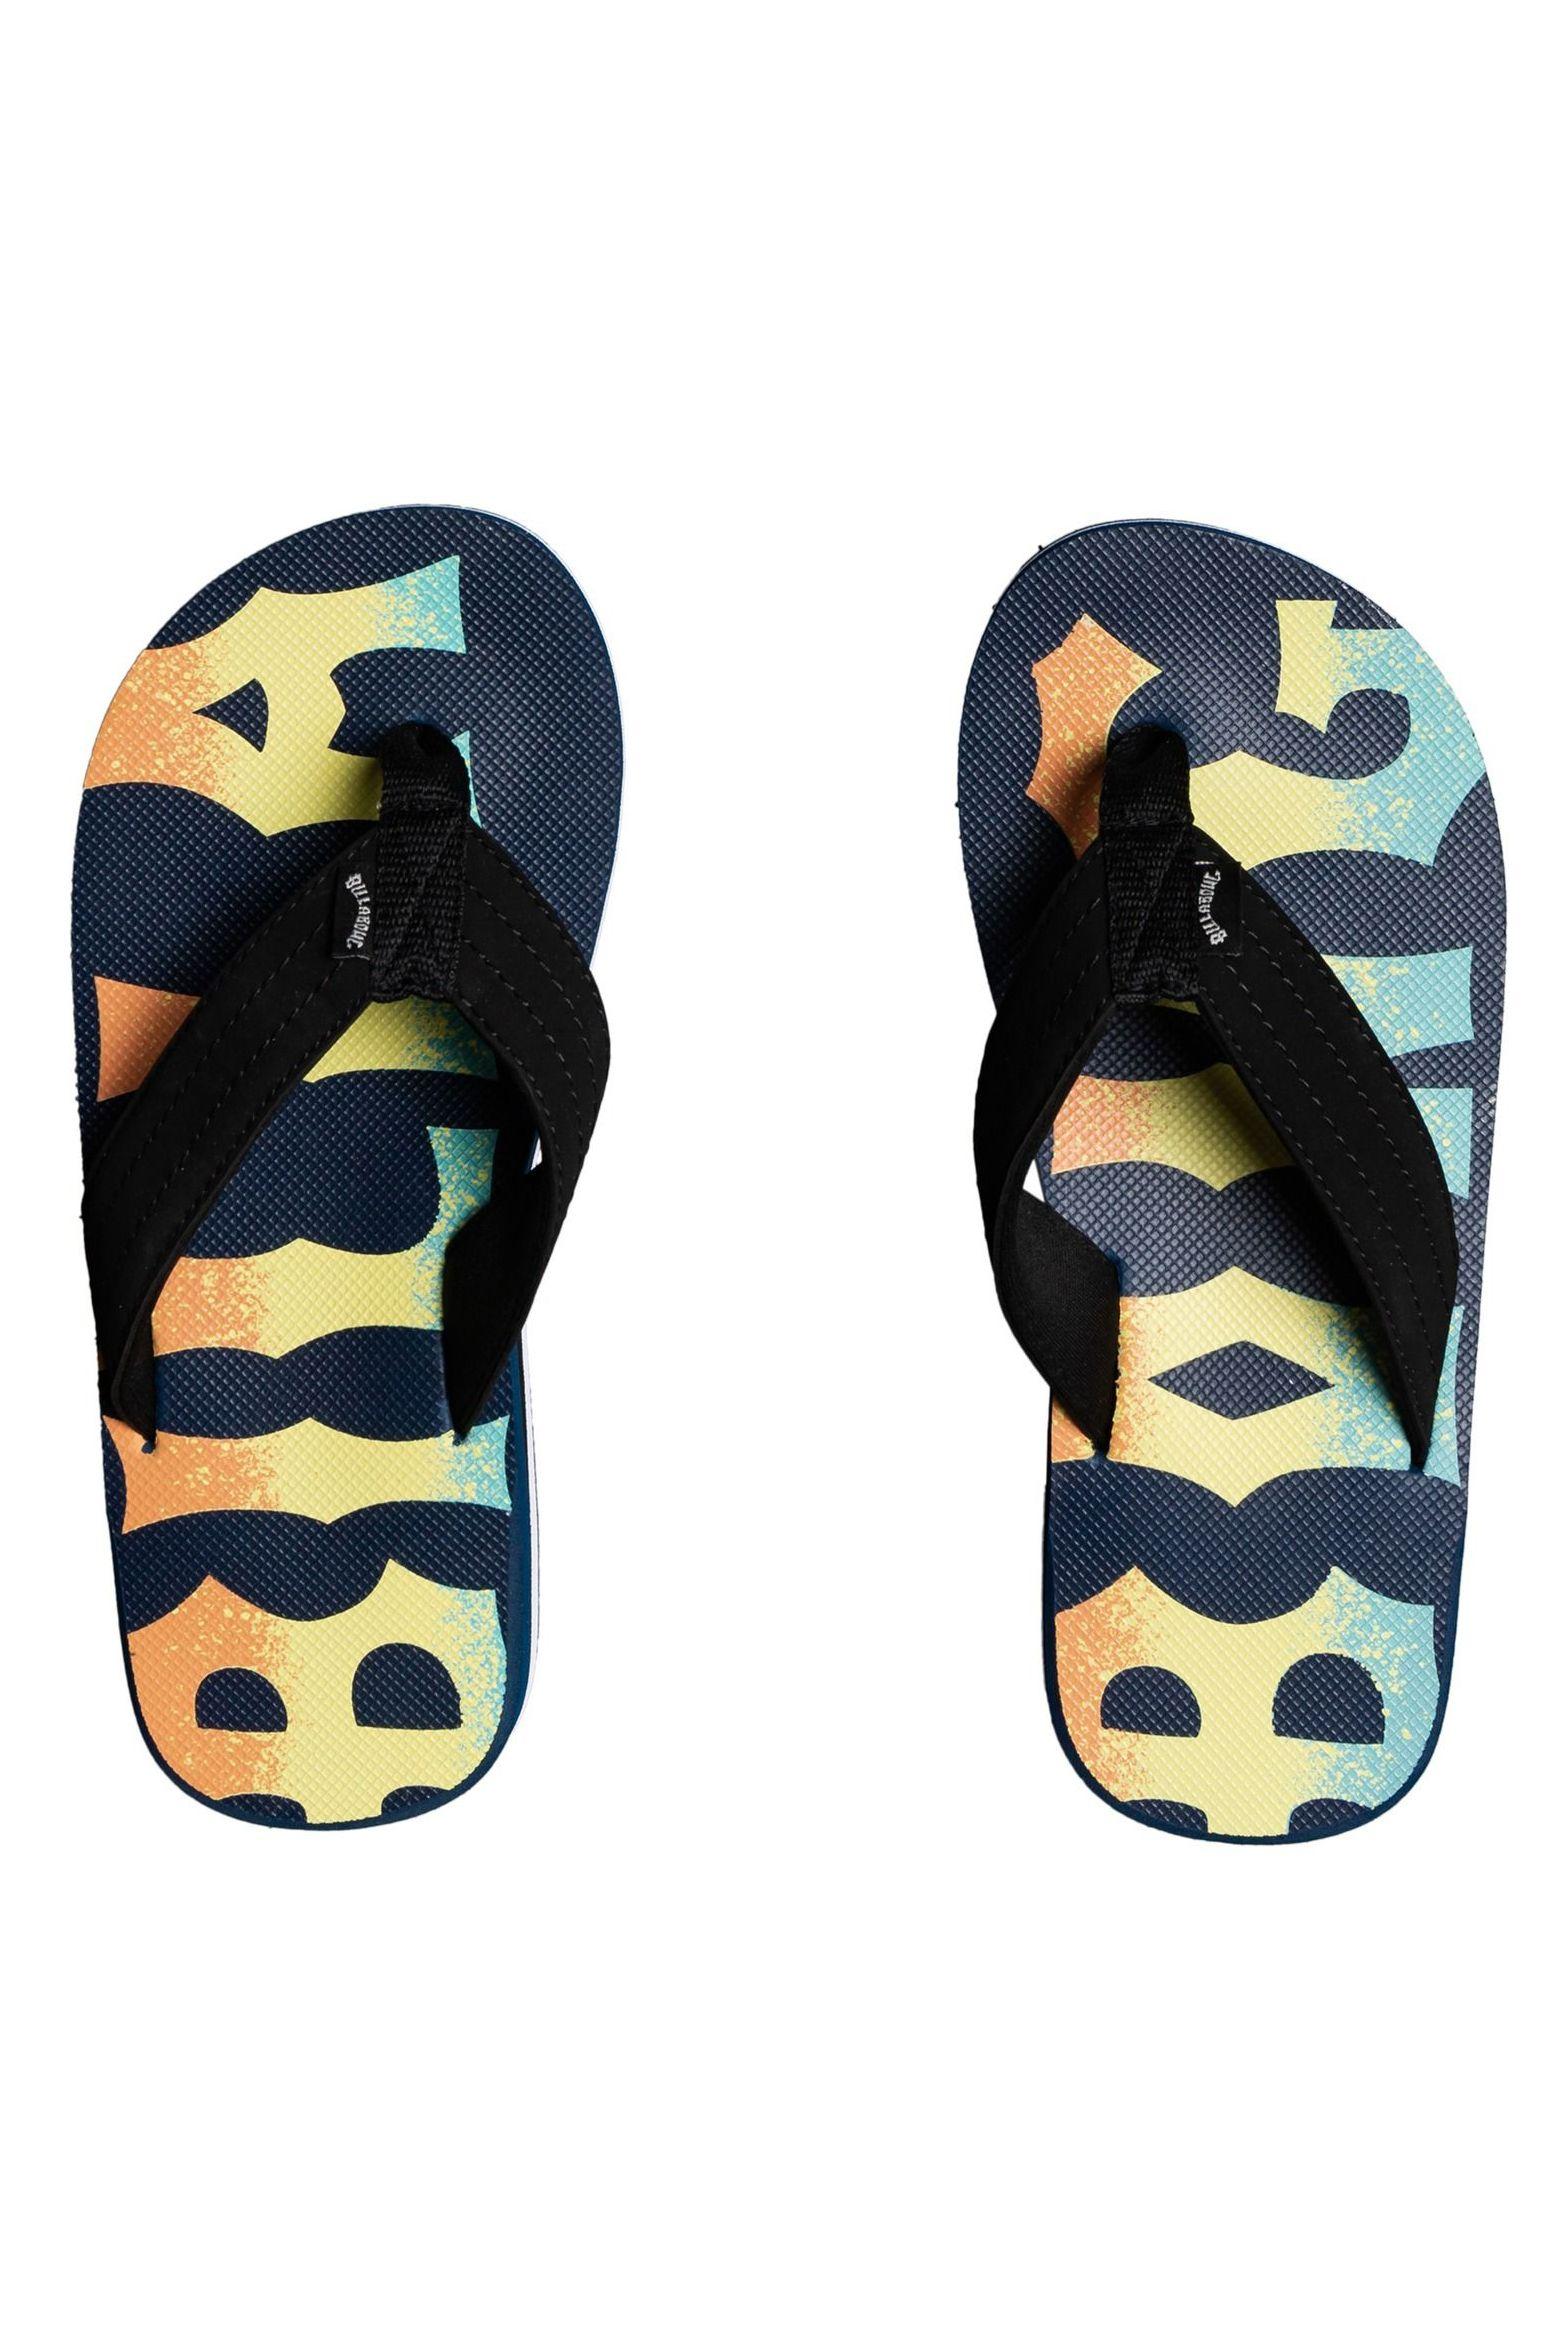 Billabong Sandals ALL DAY THEME BOY Multi